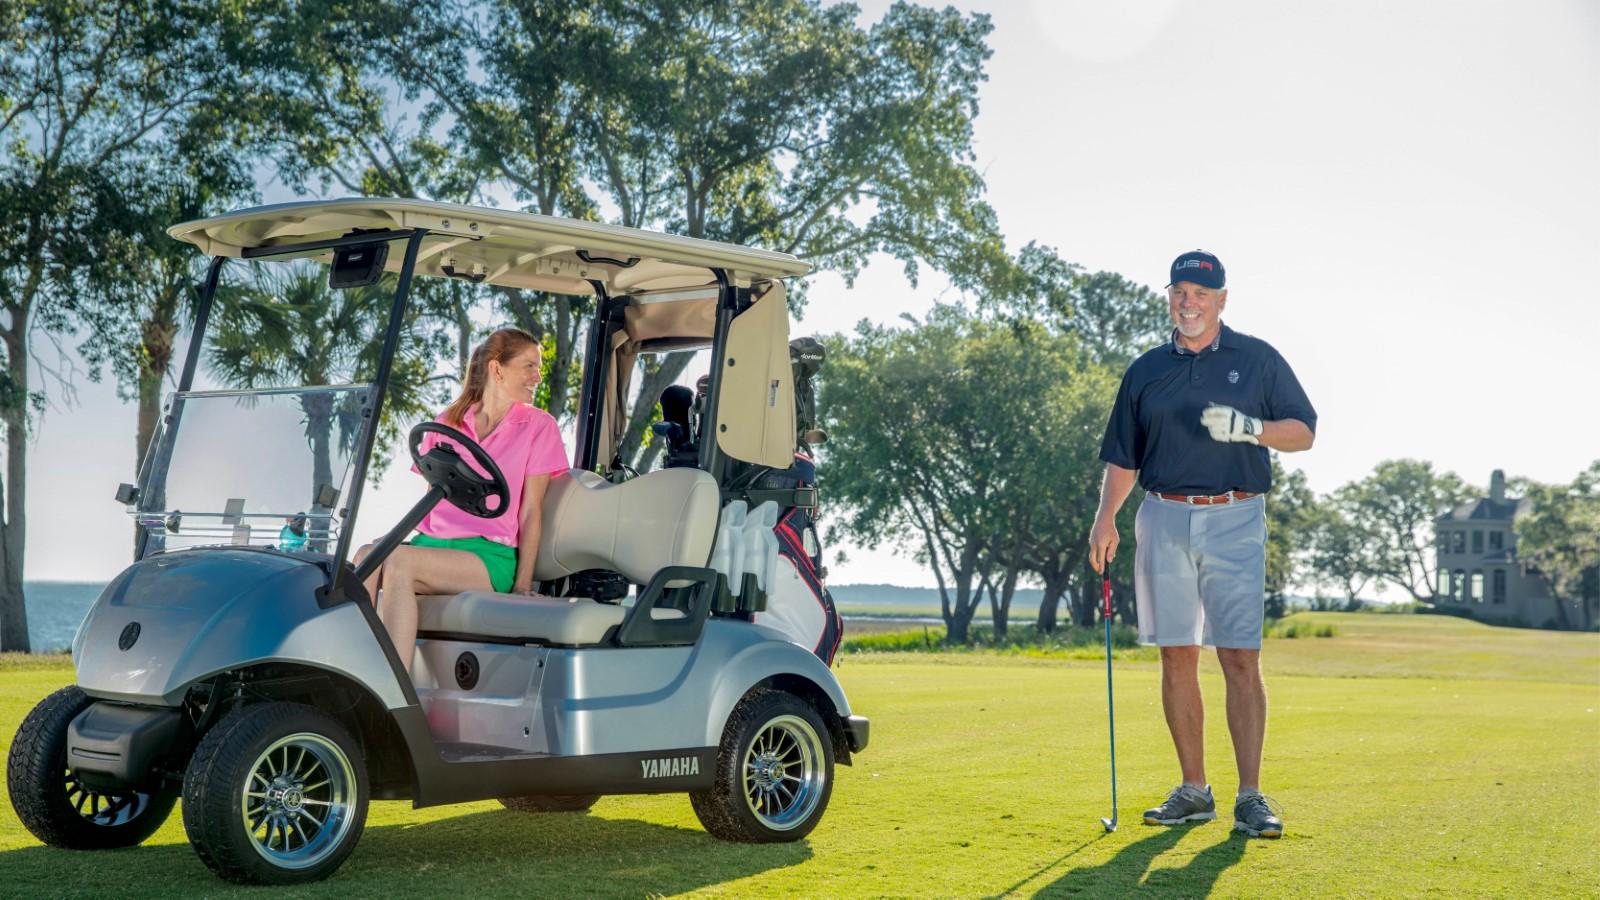 Dataw_Island_Beaufort_Golf_Courses (Custom)